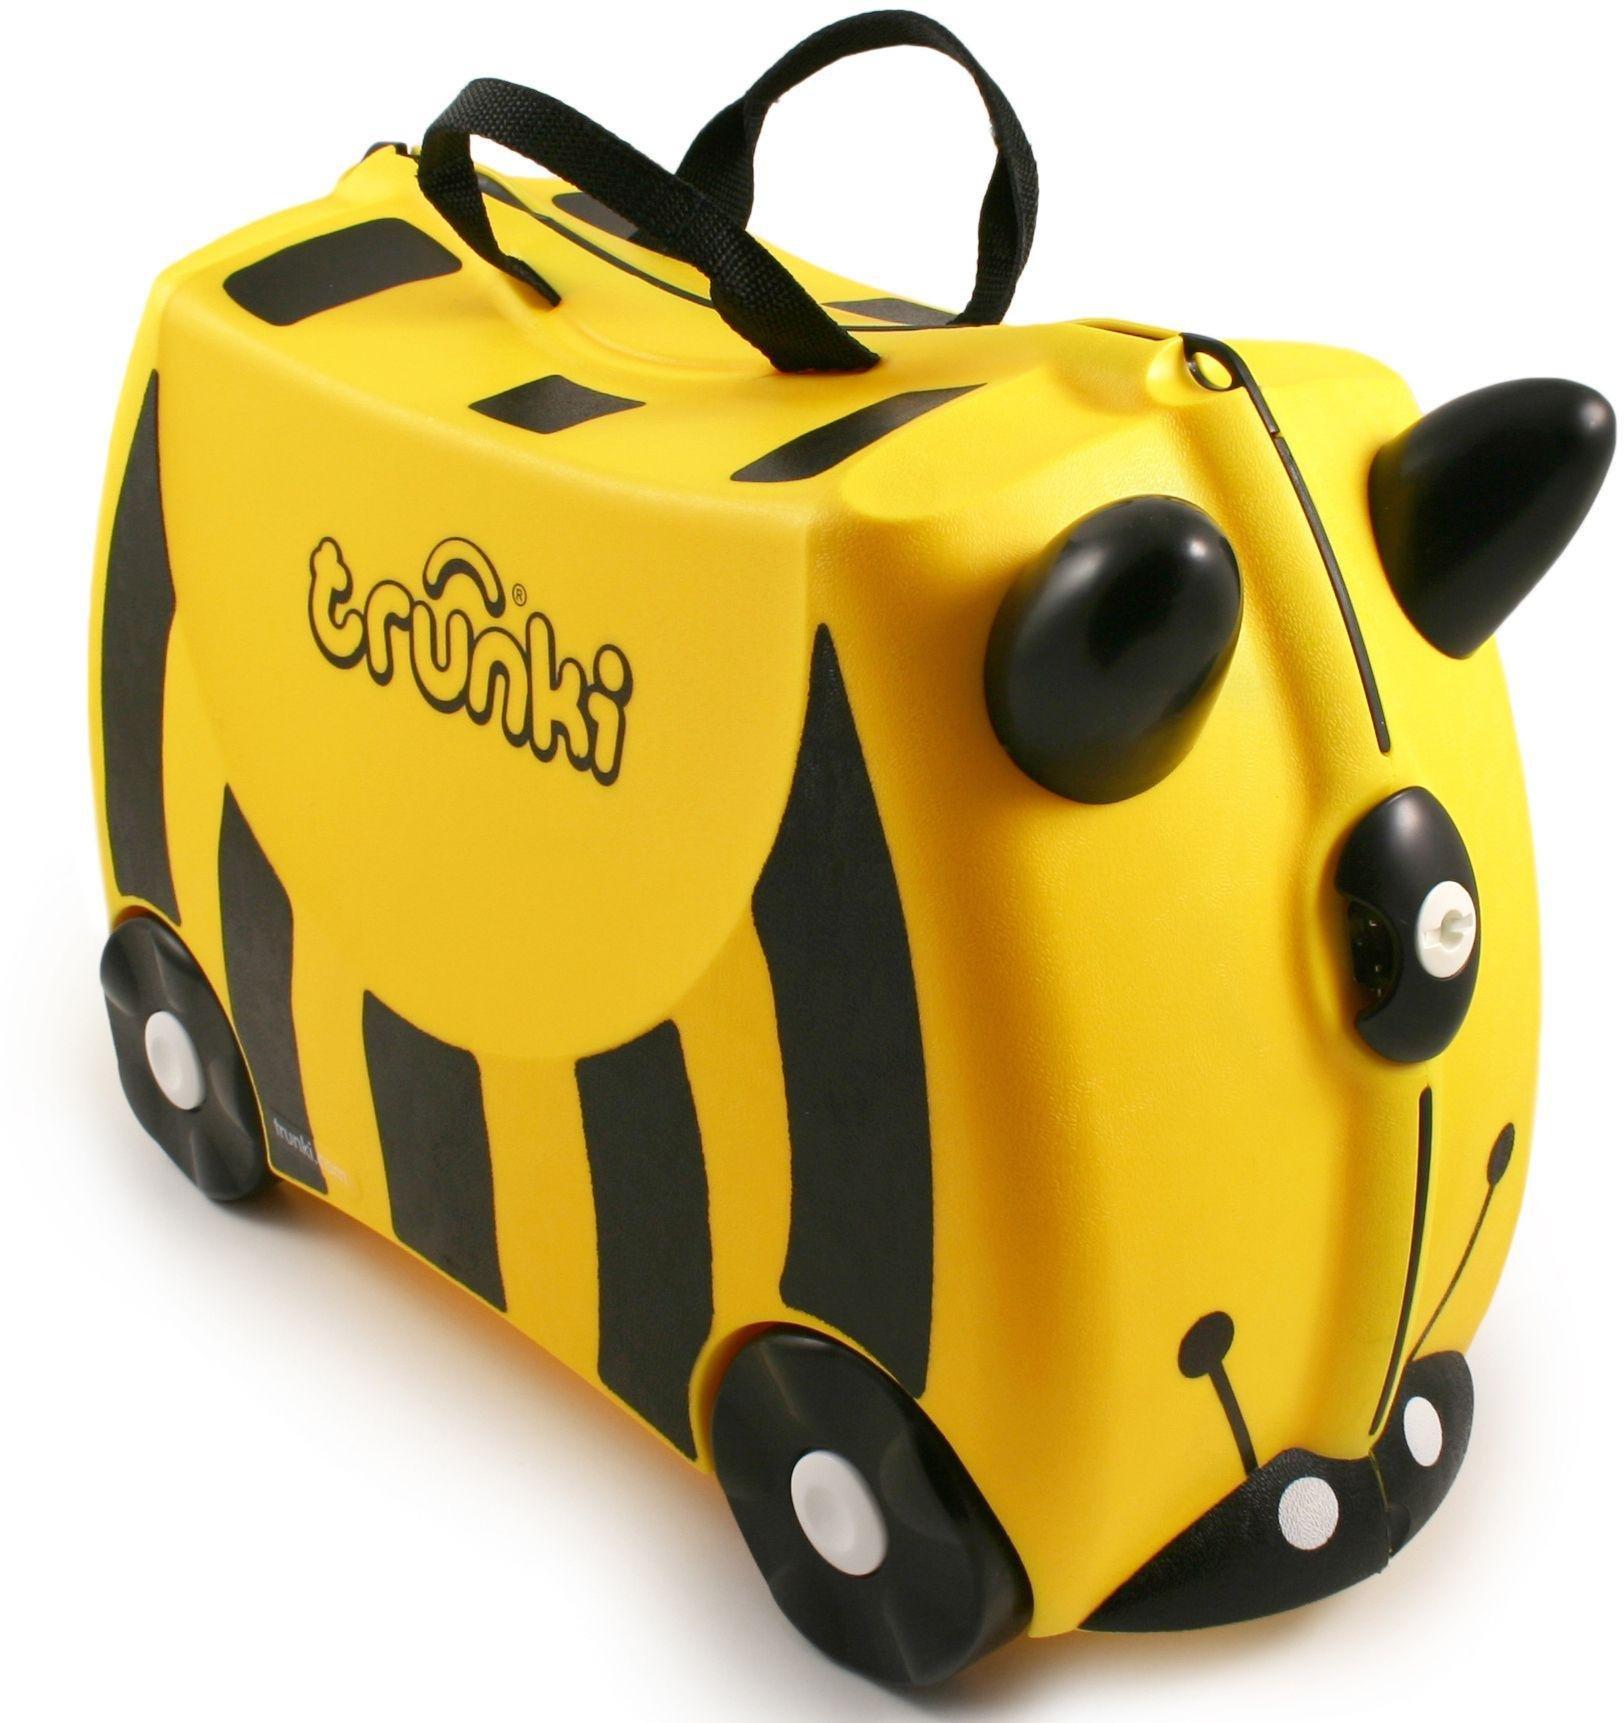 Trunki Bernard Bee 4 Wheel Hard Ride On Suitcase - Yellow